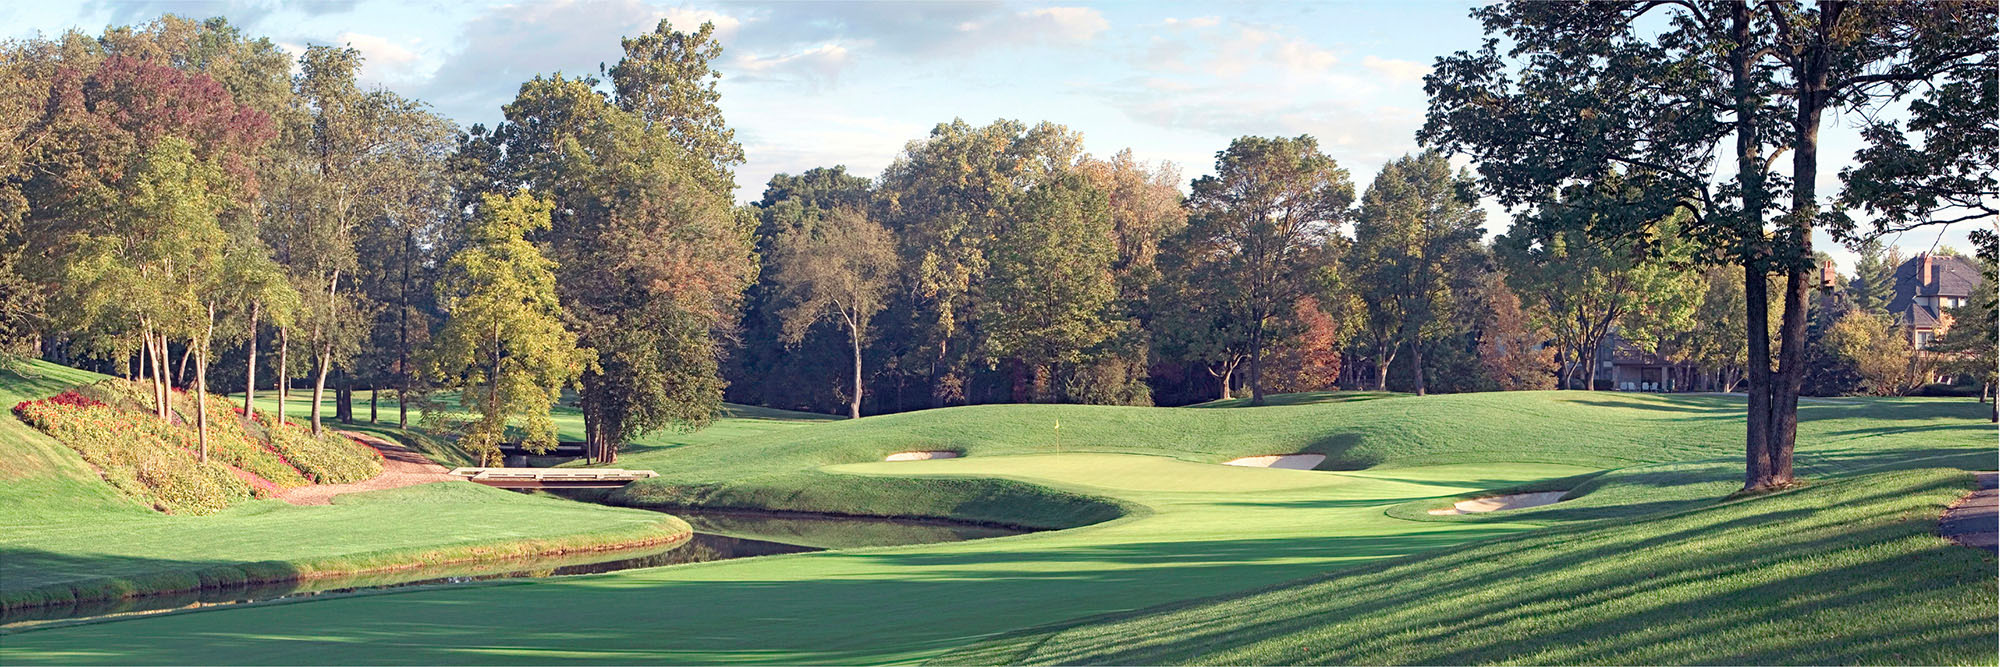 Golf Course Image - Muirfield Village No. 5